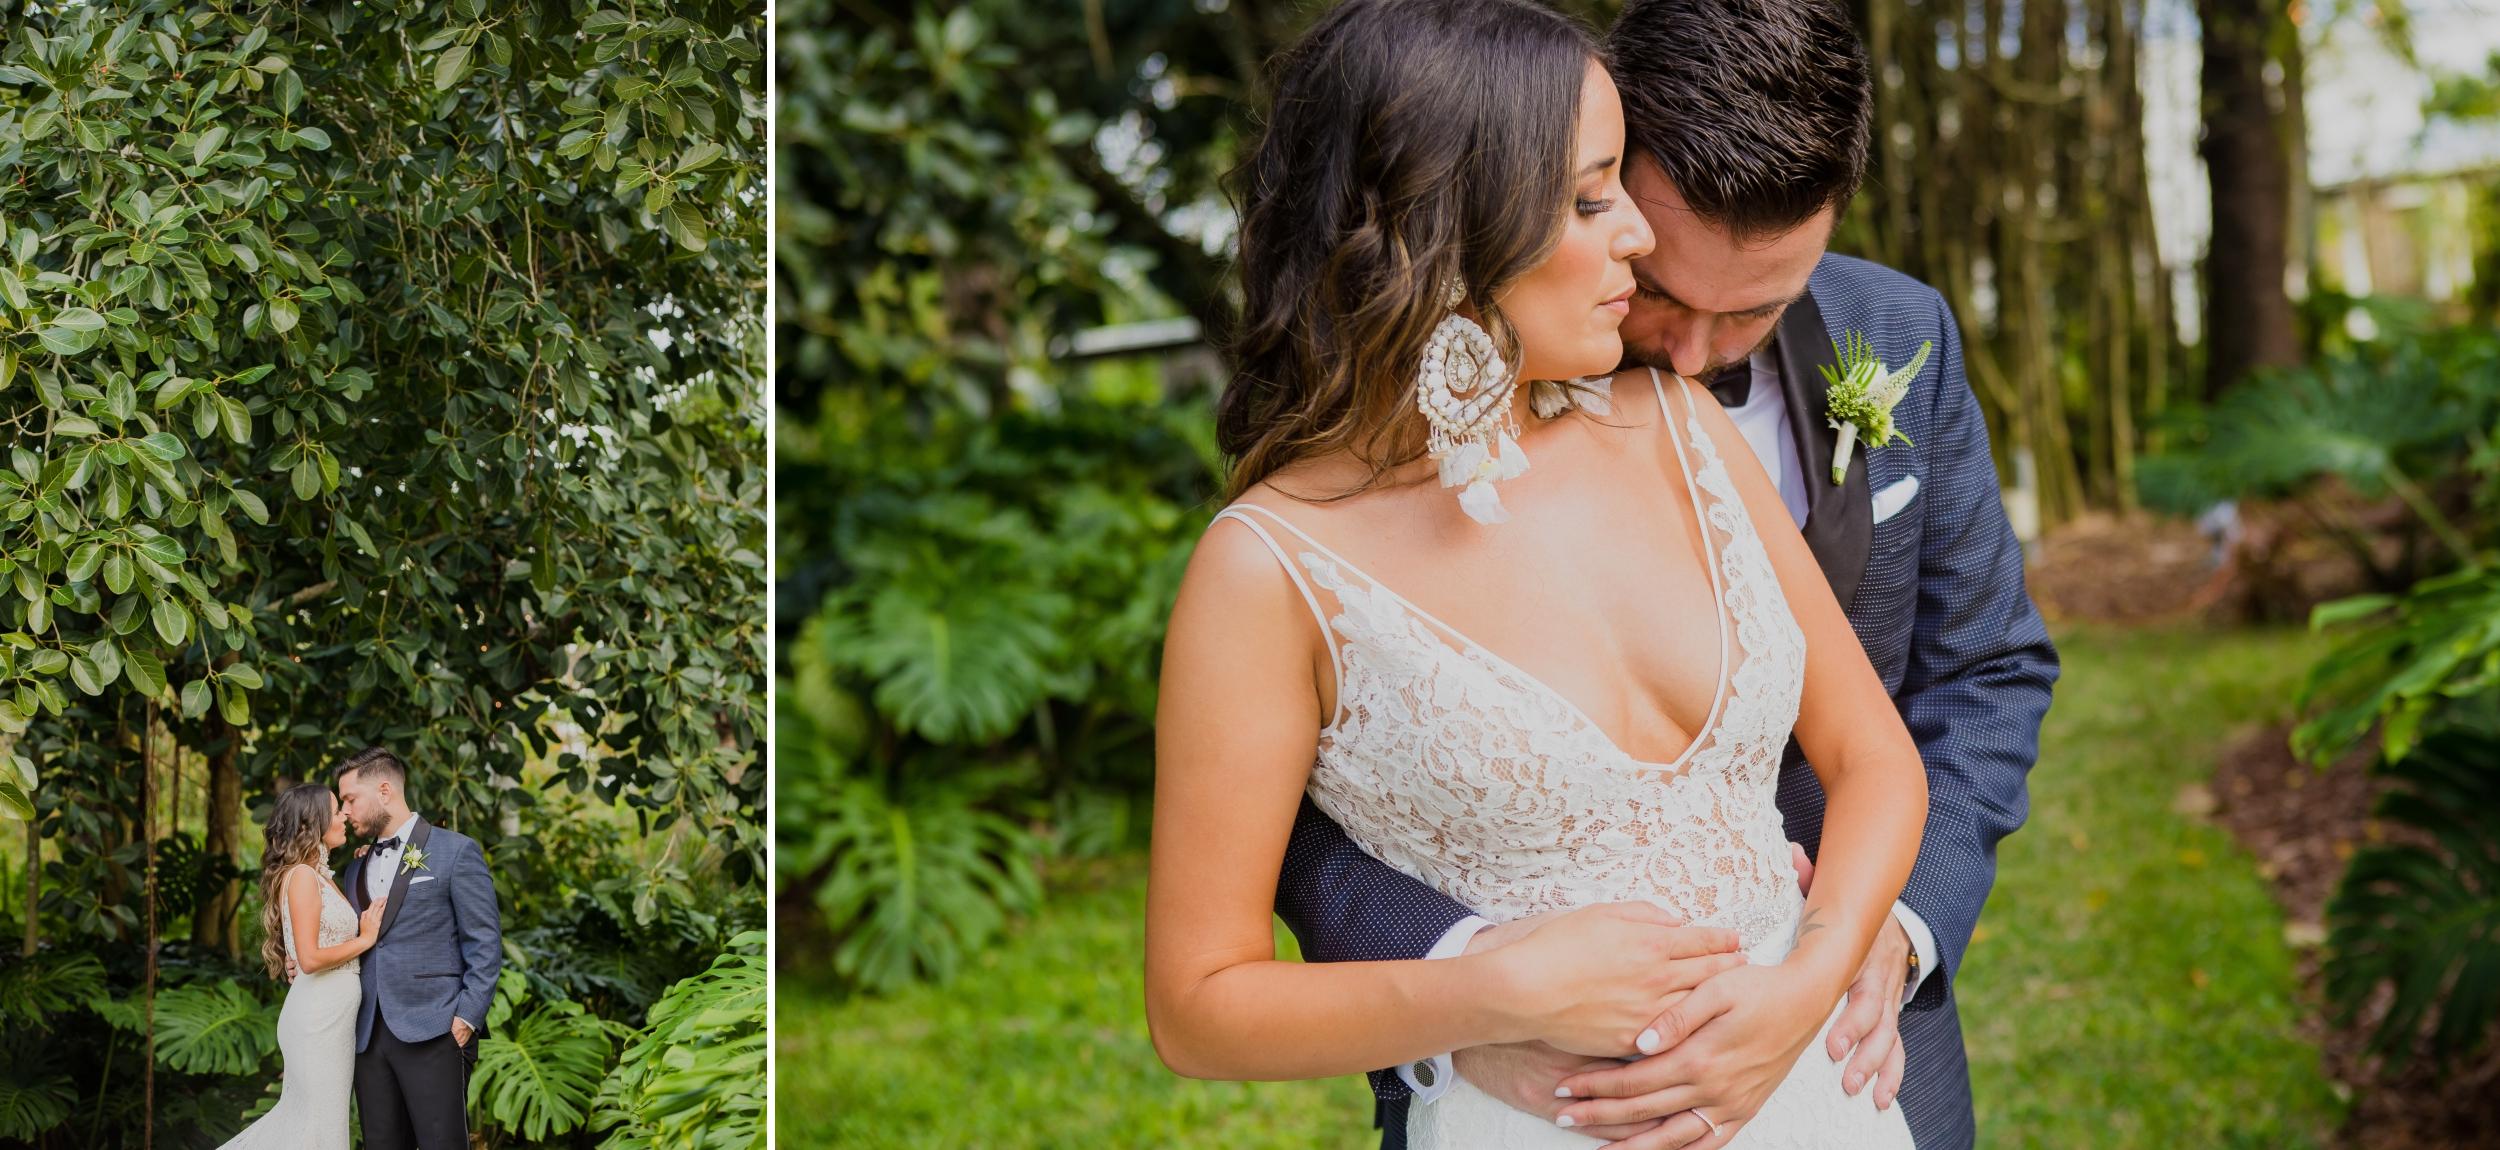 Wedding Whimsical Key West House  - Photography by Santy Martinez 9.jpg